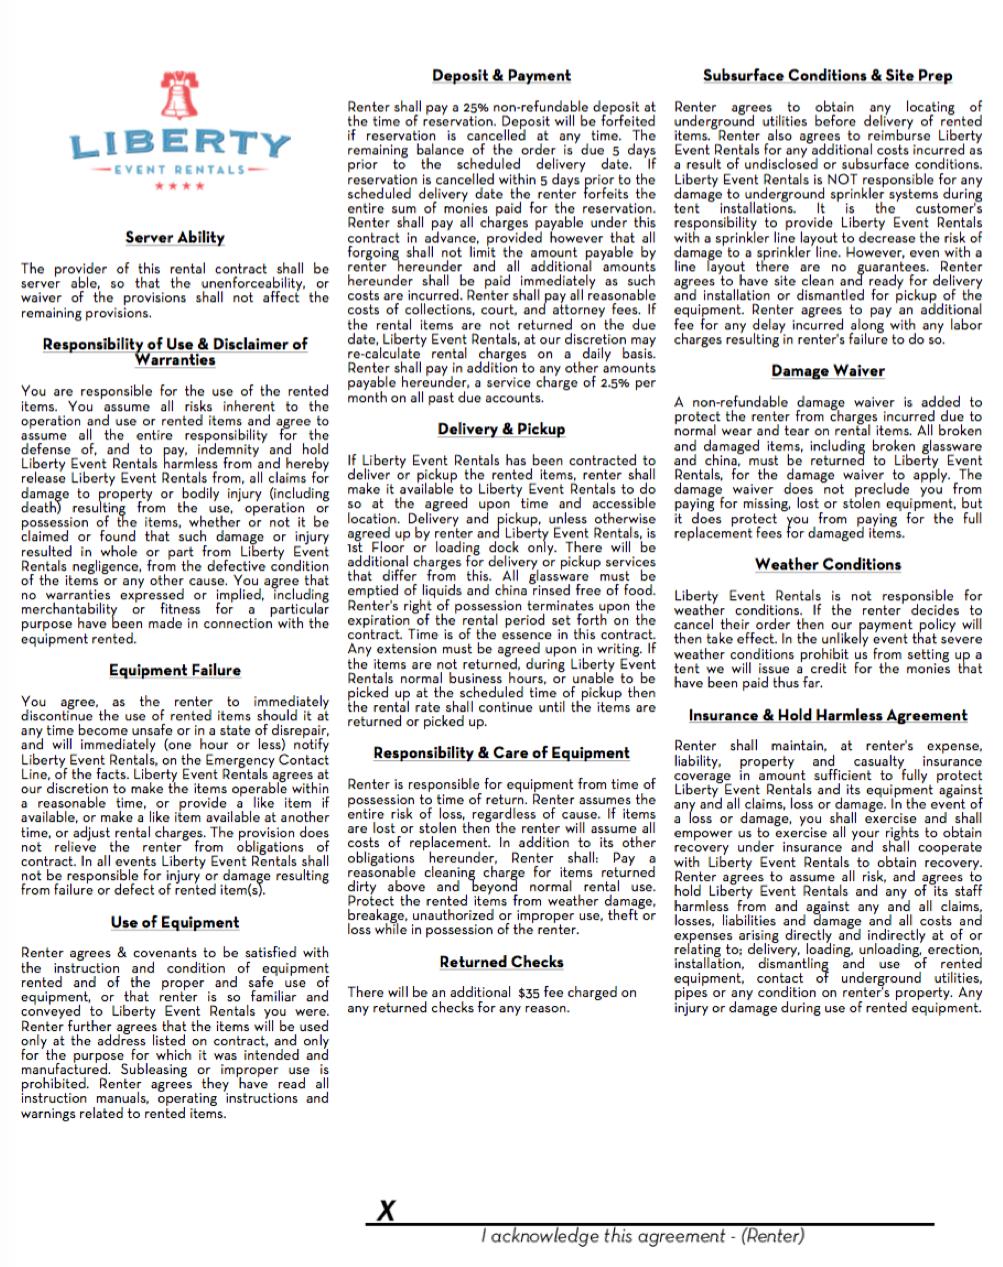 Rental Agreement Information Liberty Event Rentals